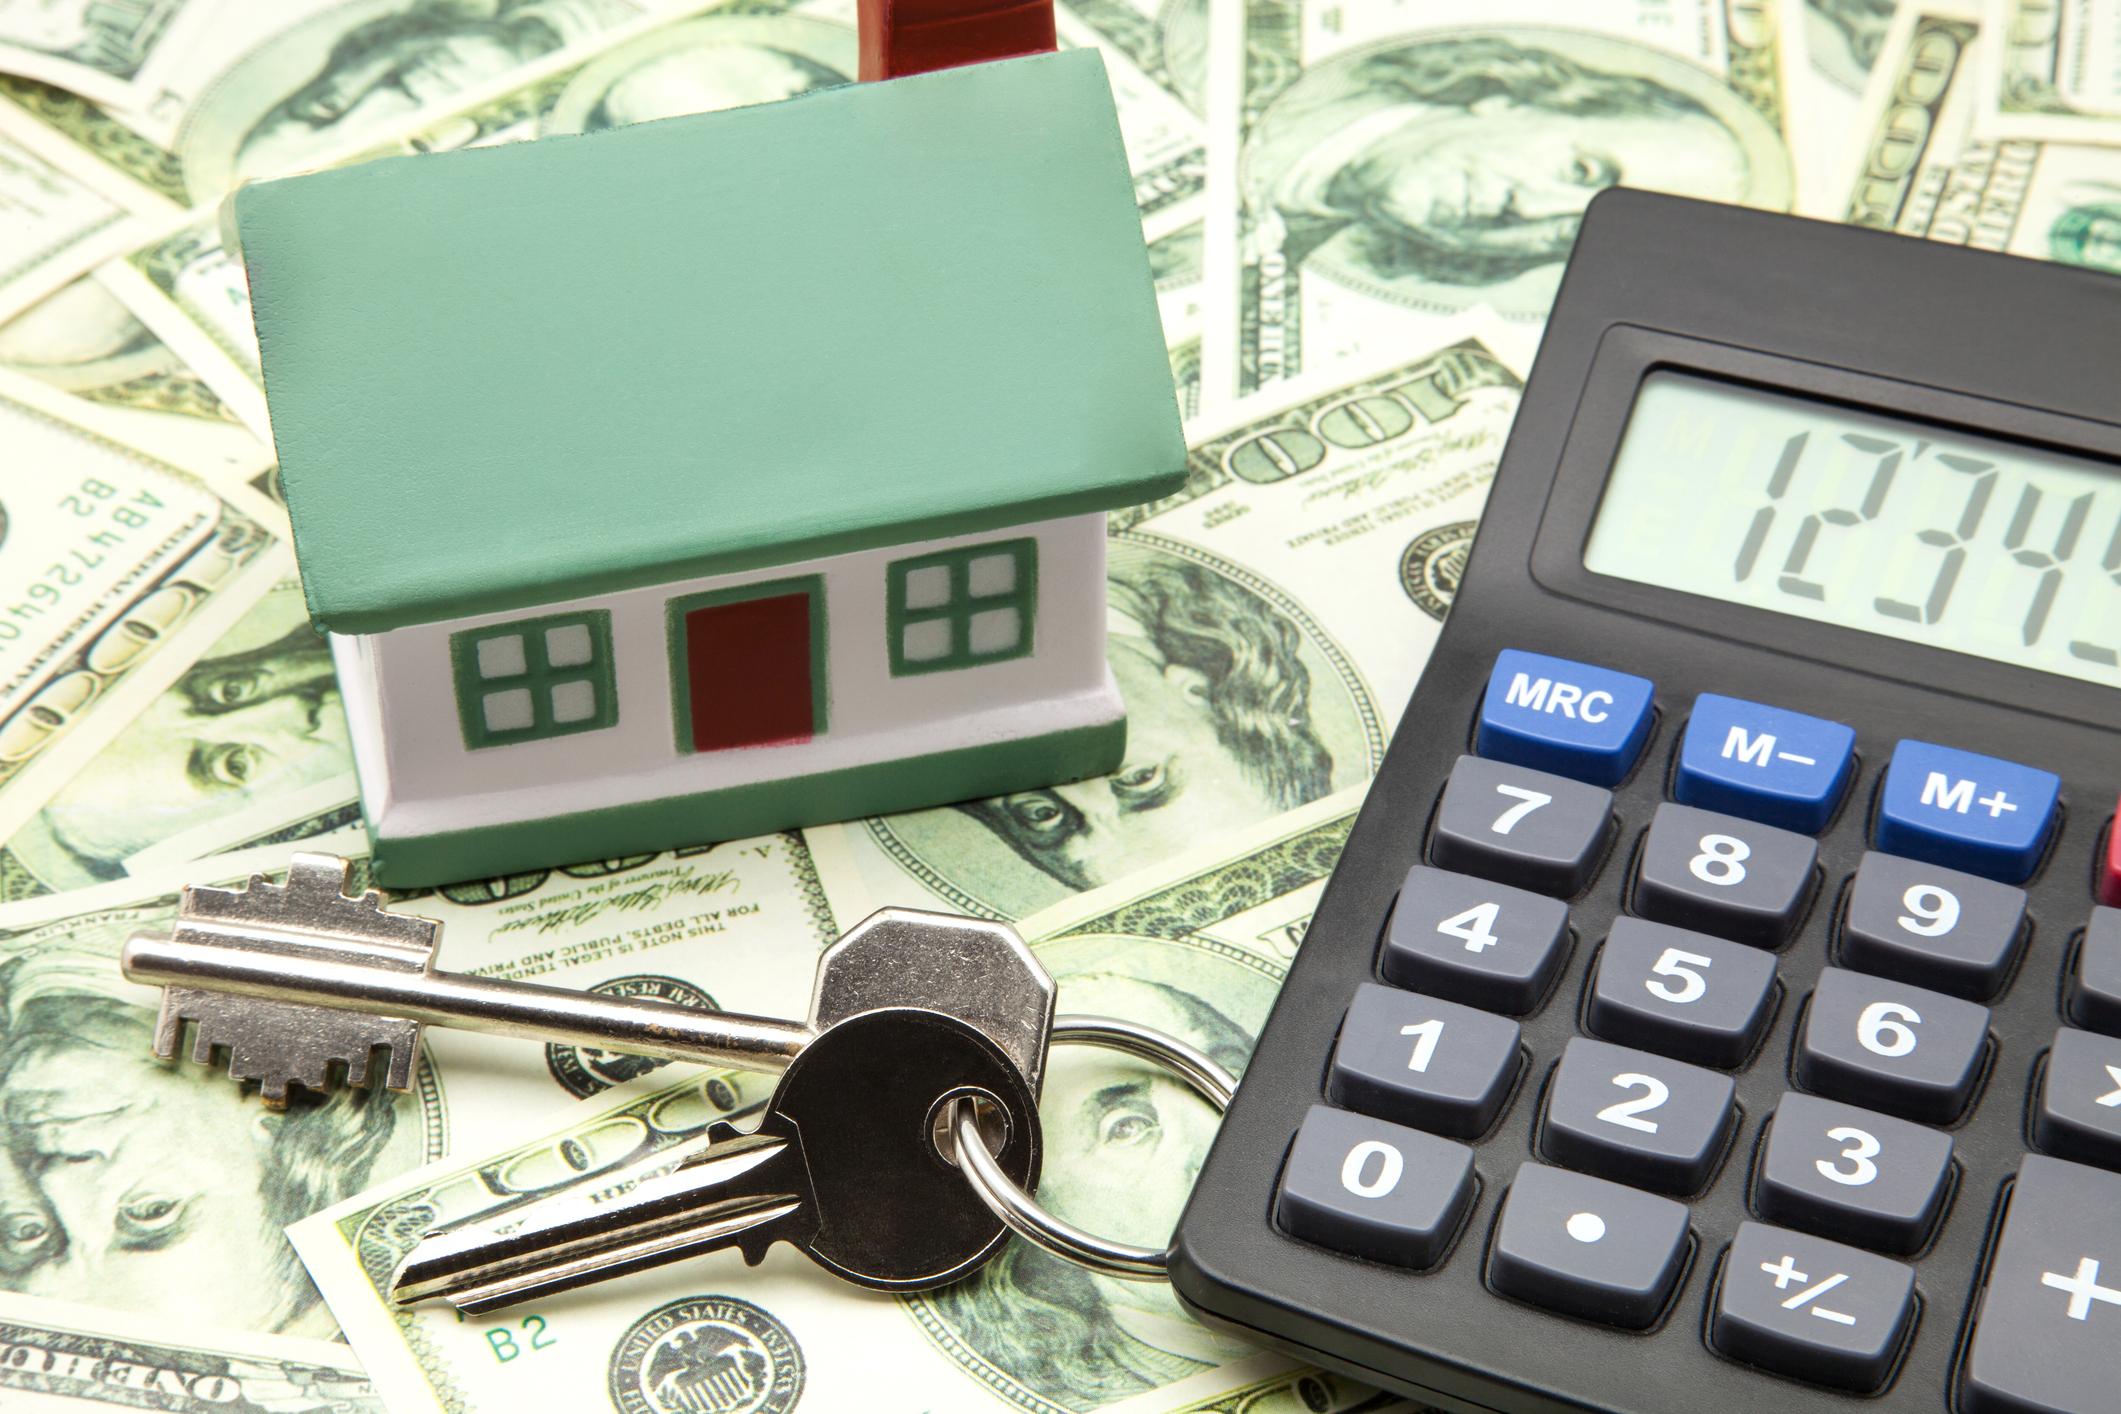 House, calculator, money, and keys.